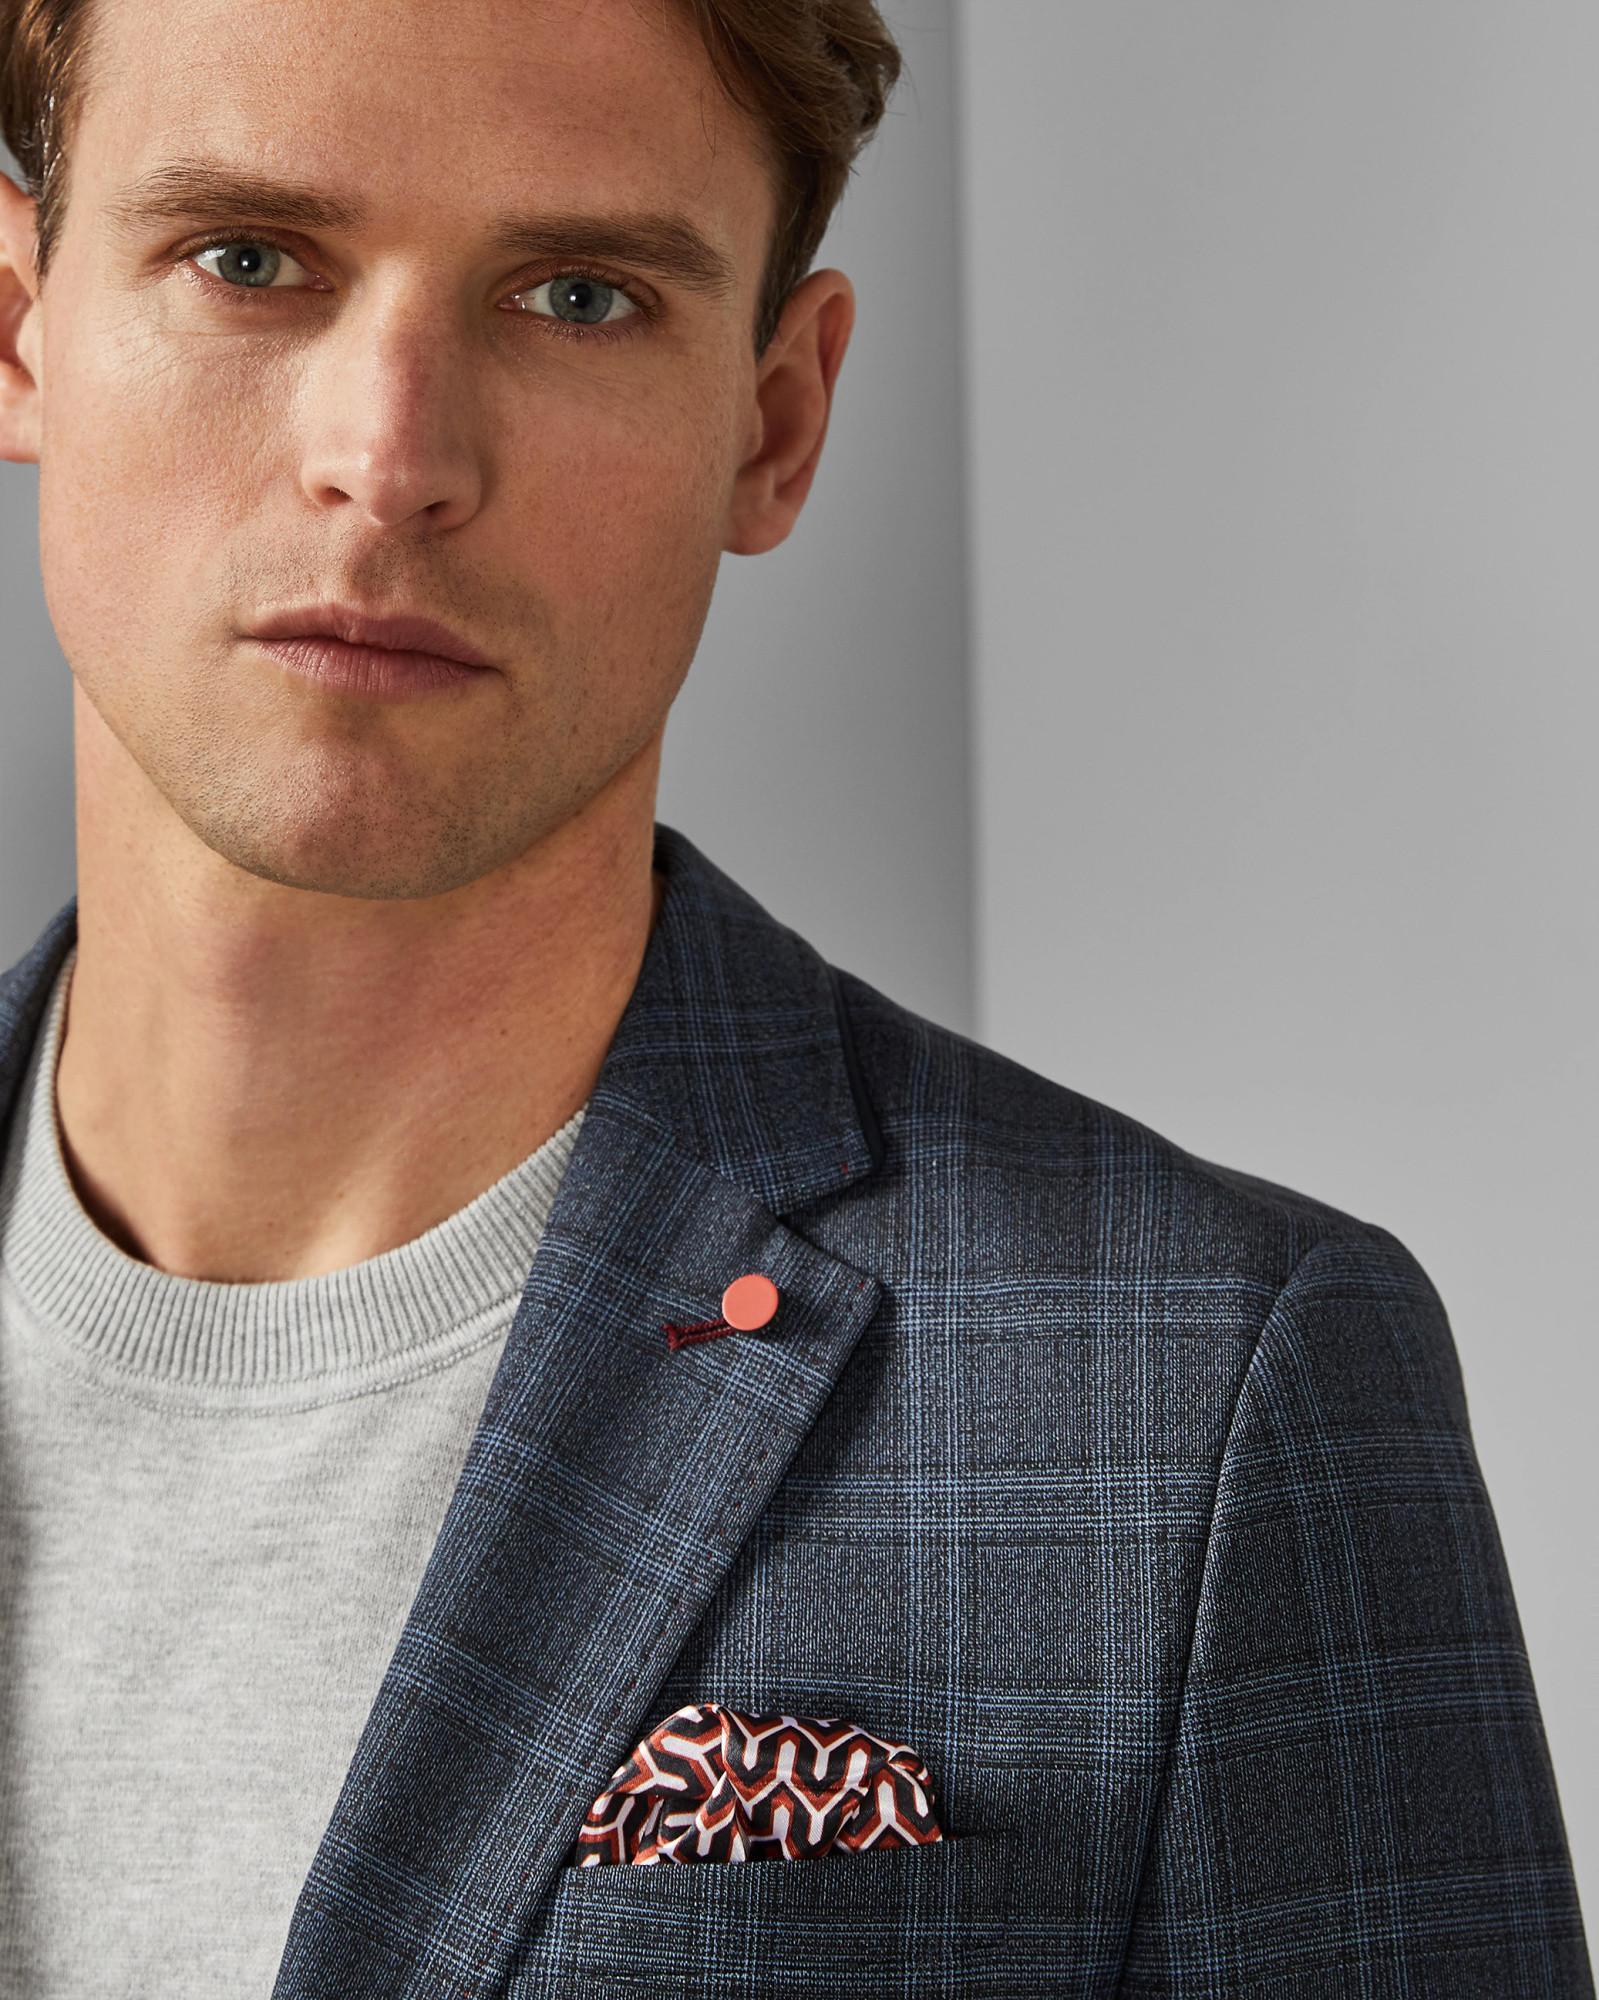 c004dbda3 Ted Baker Check Jacket in Blue for Men - Lyst